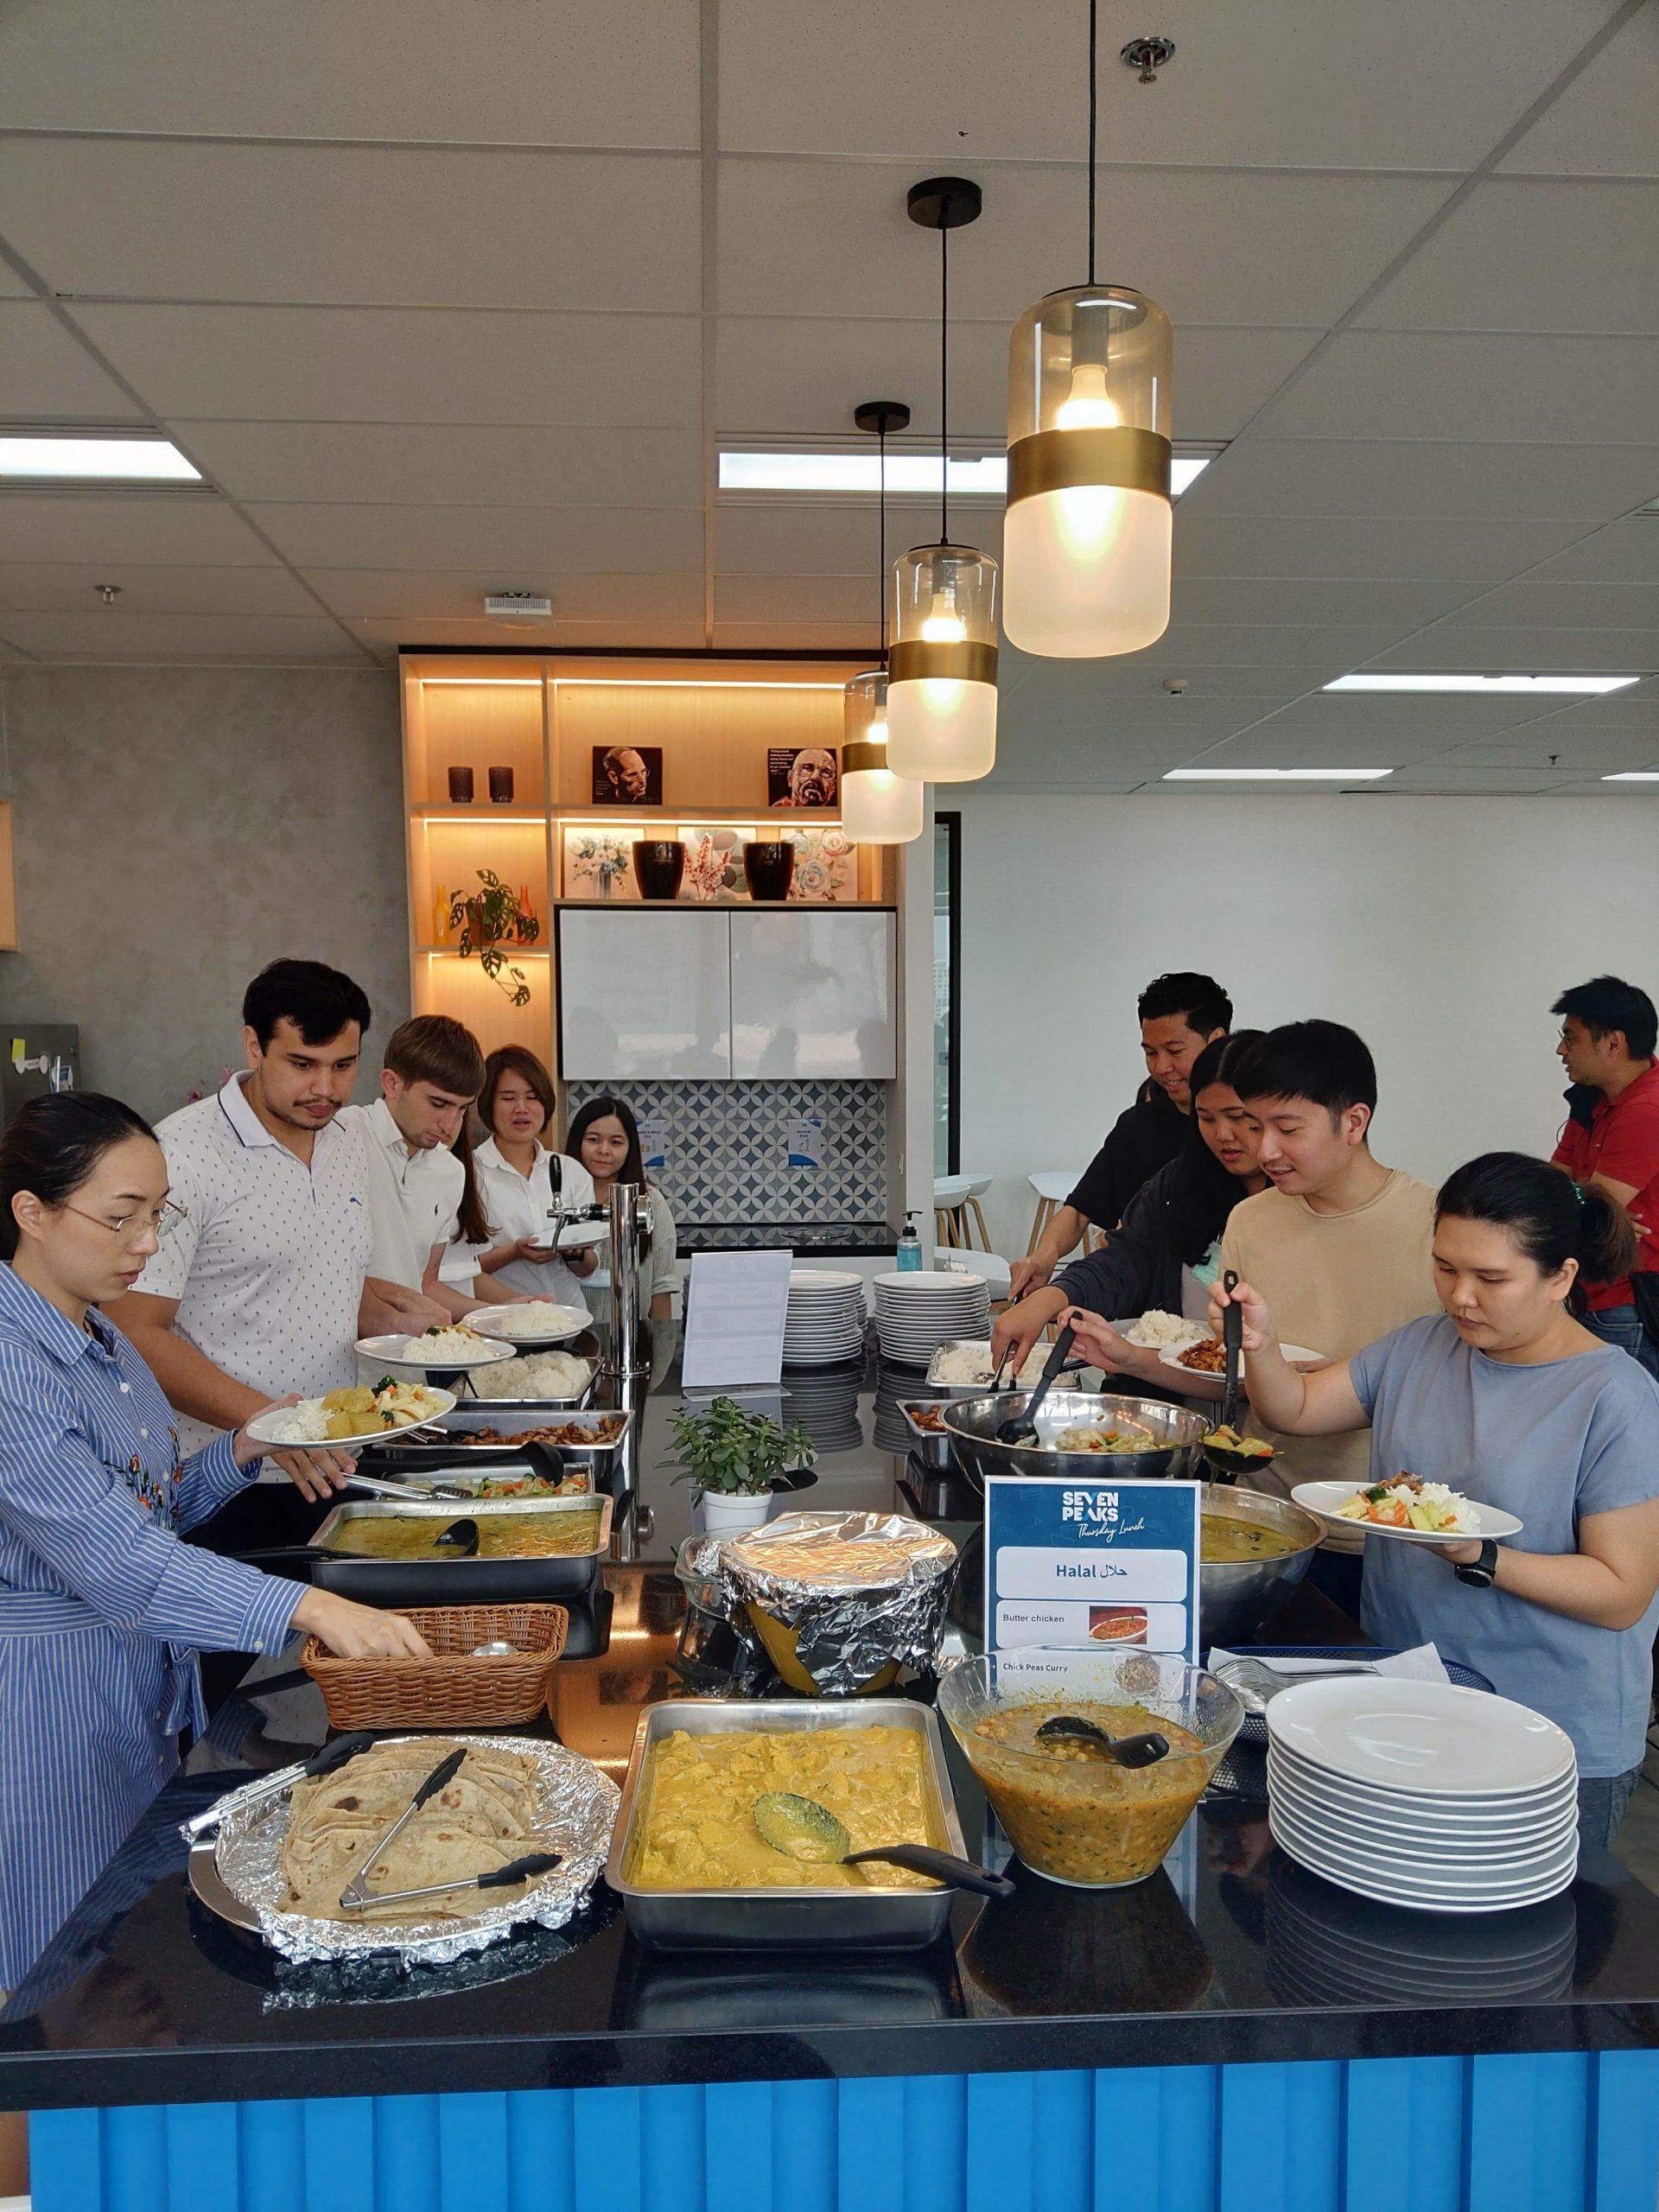 Internship Digital marketing - Lunch at the office